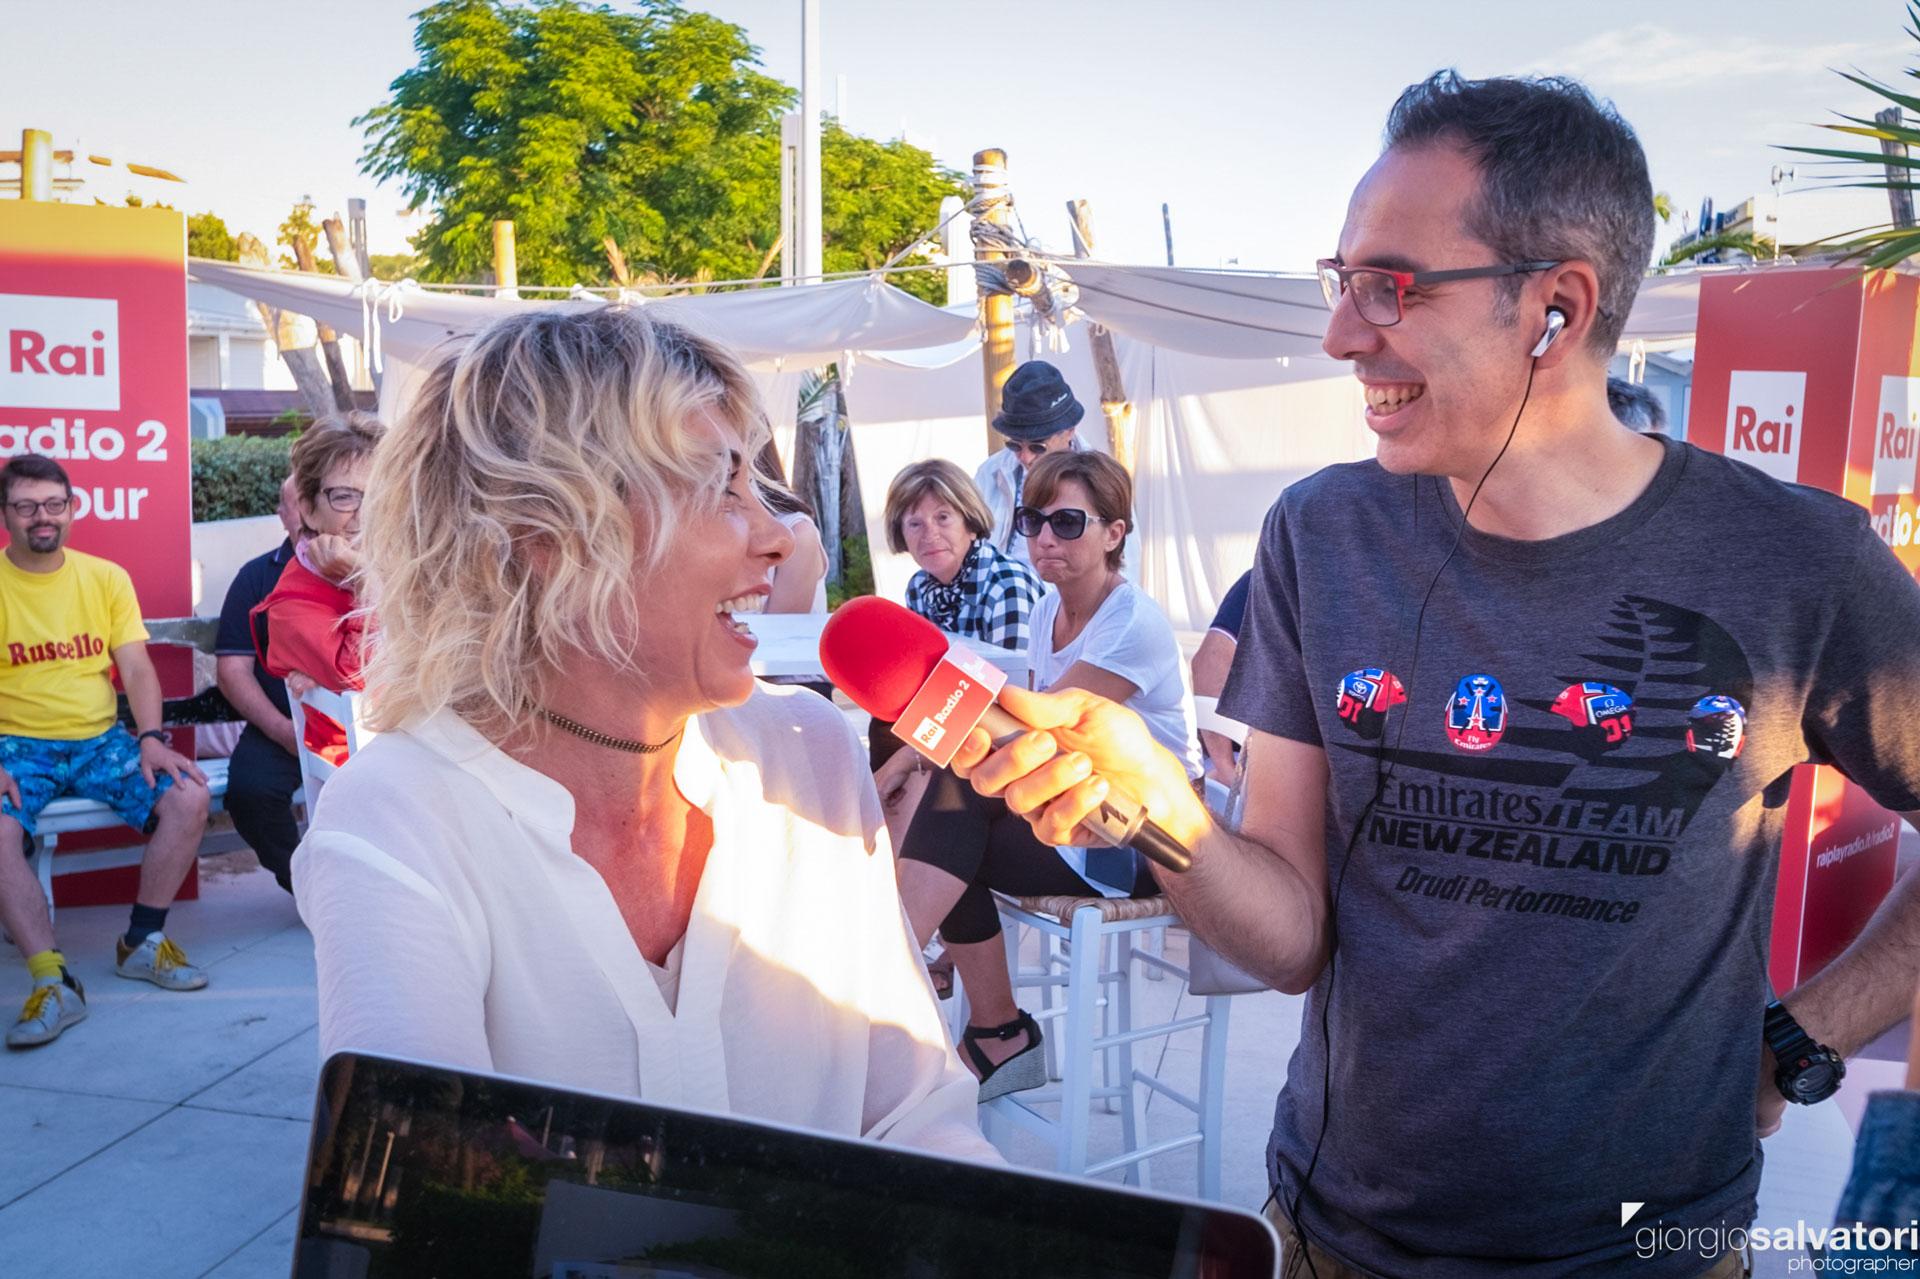 Intervista a Sabrina Campanella di mytrolleyblog su Caterpillar in diretta da Riccione - Radio 2